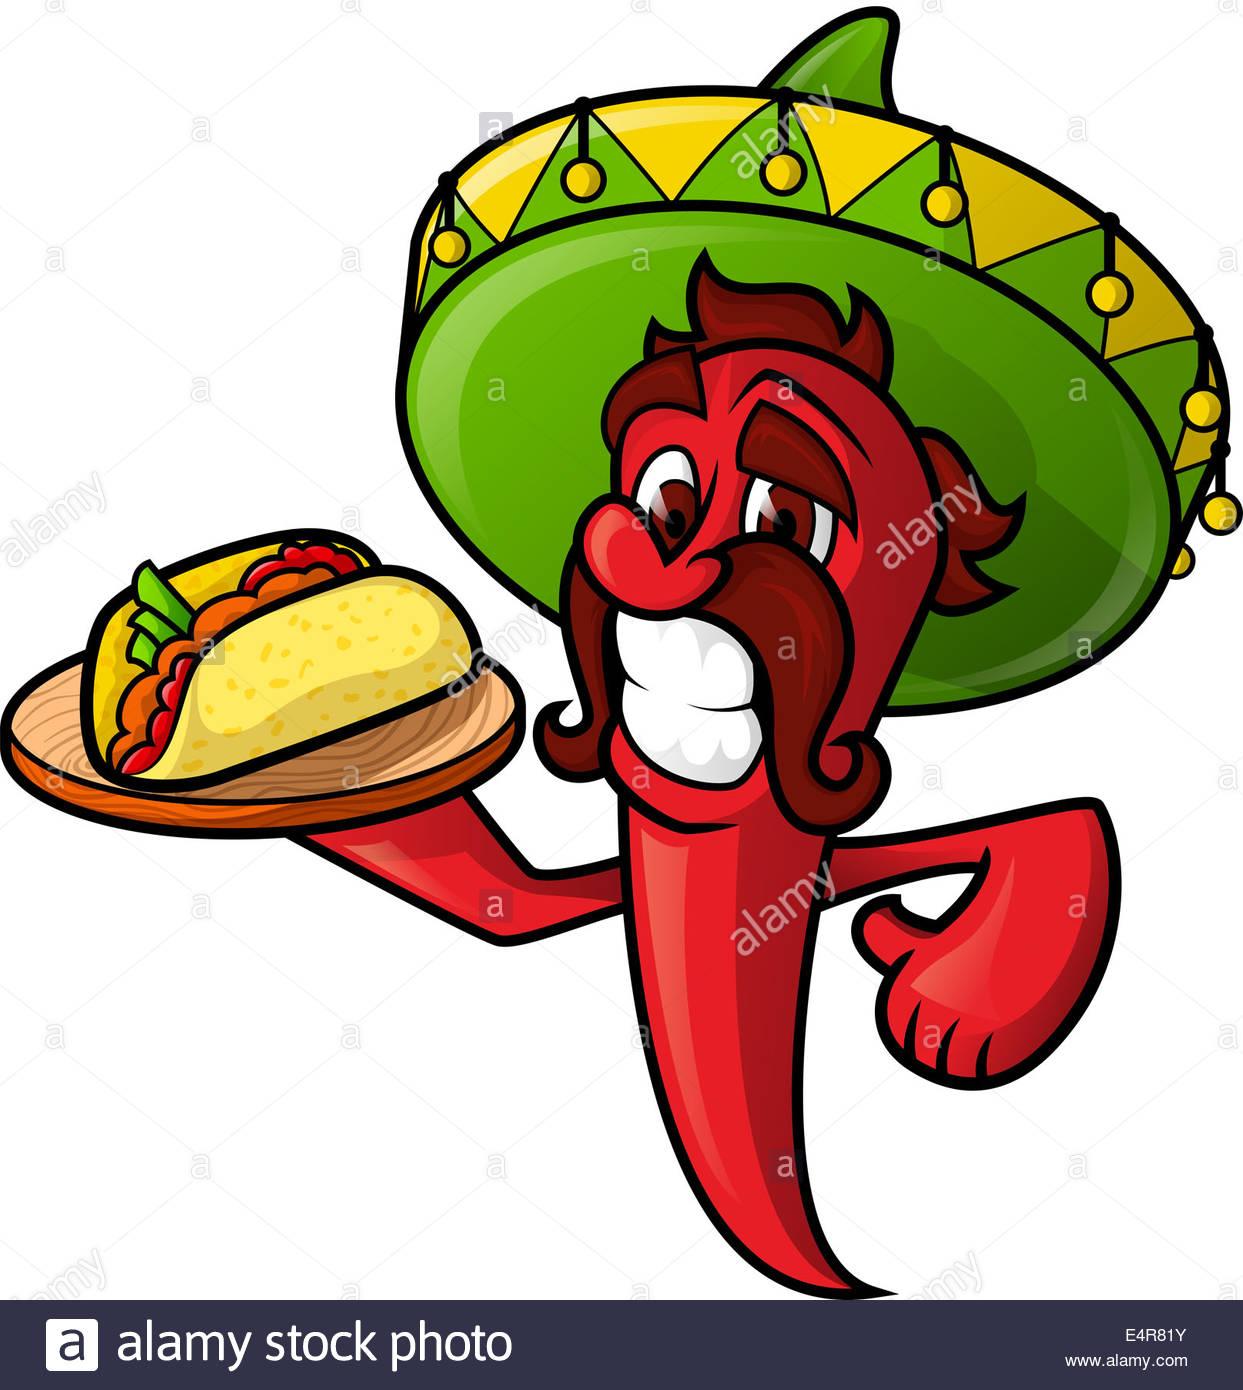 1243x1390 Mexican Food Clip Art Stock Photos Amp Mexican Food Clip Art Stock